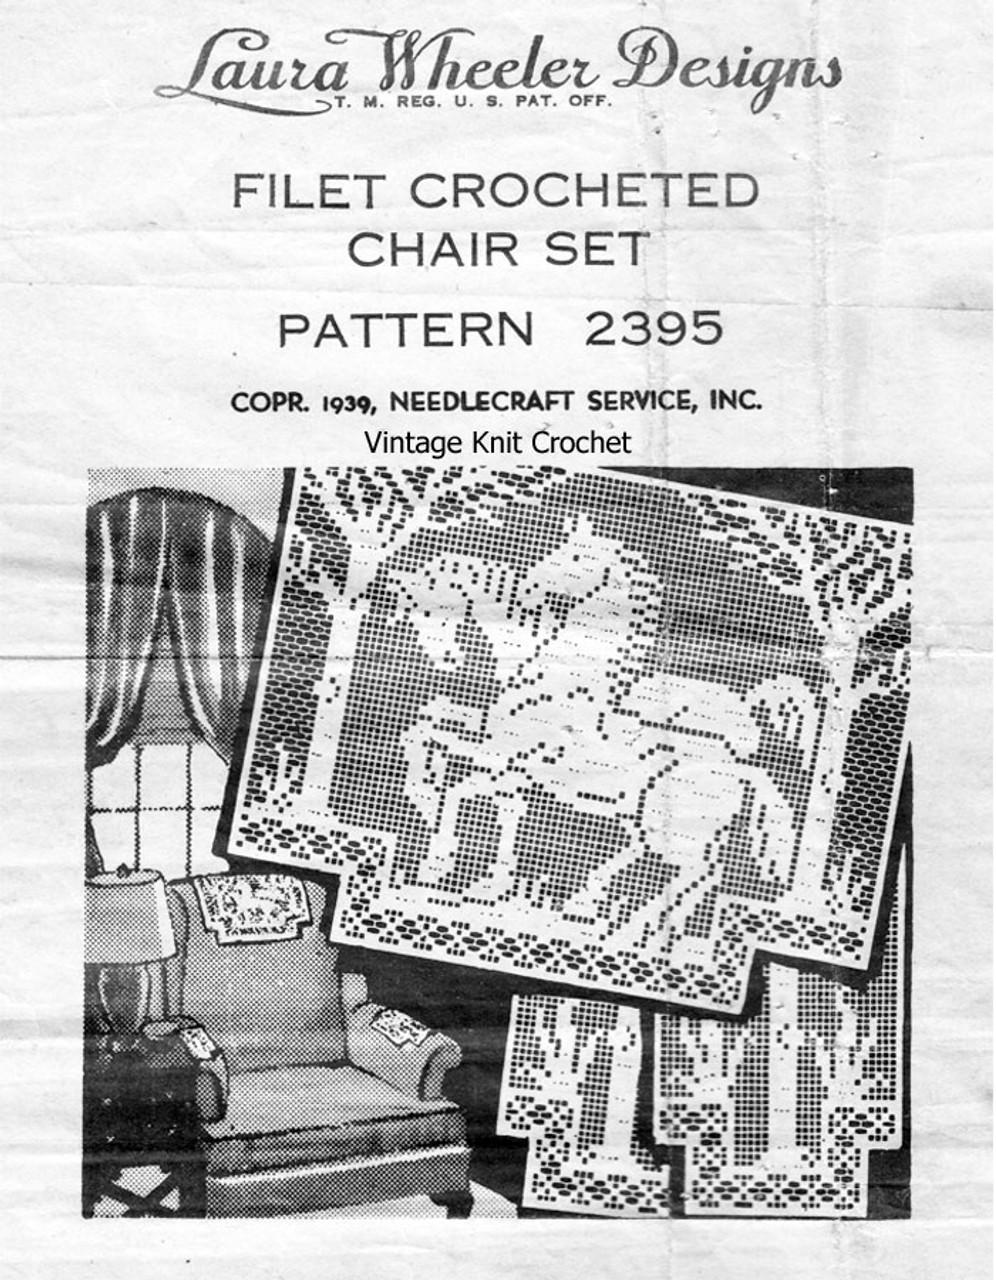 Vintage Filet Crochet Prancing Stallions Pattern laura wheeler 2395